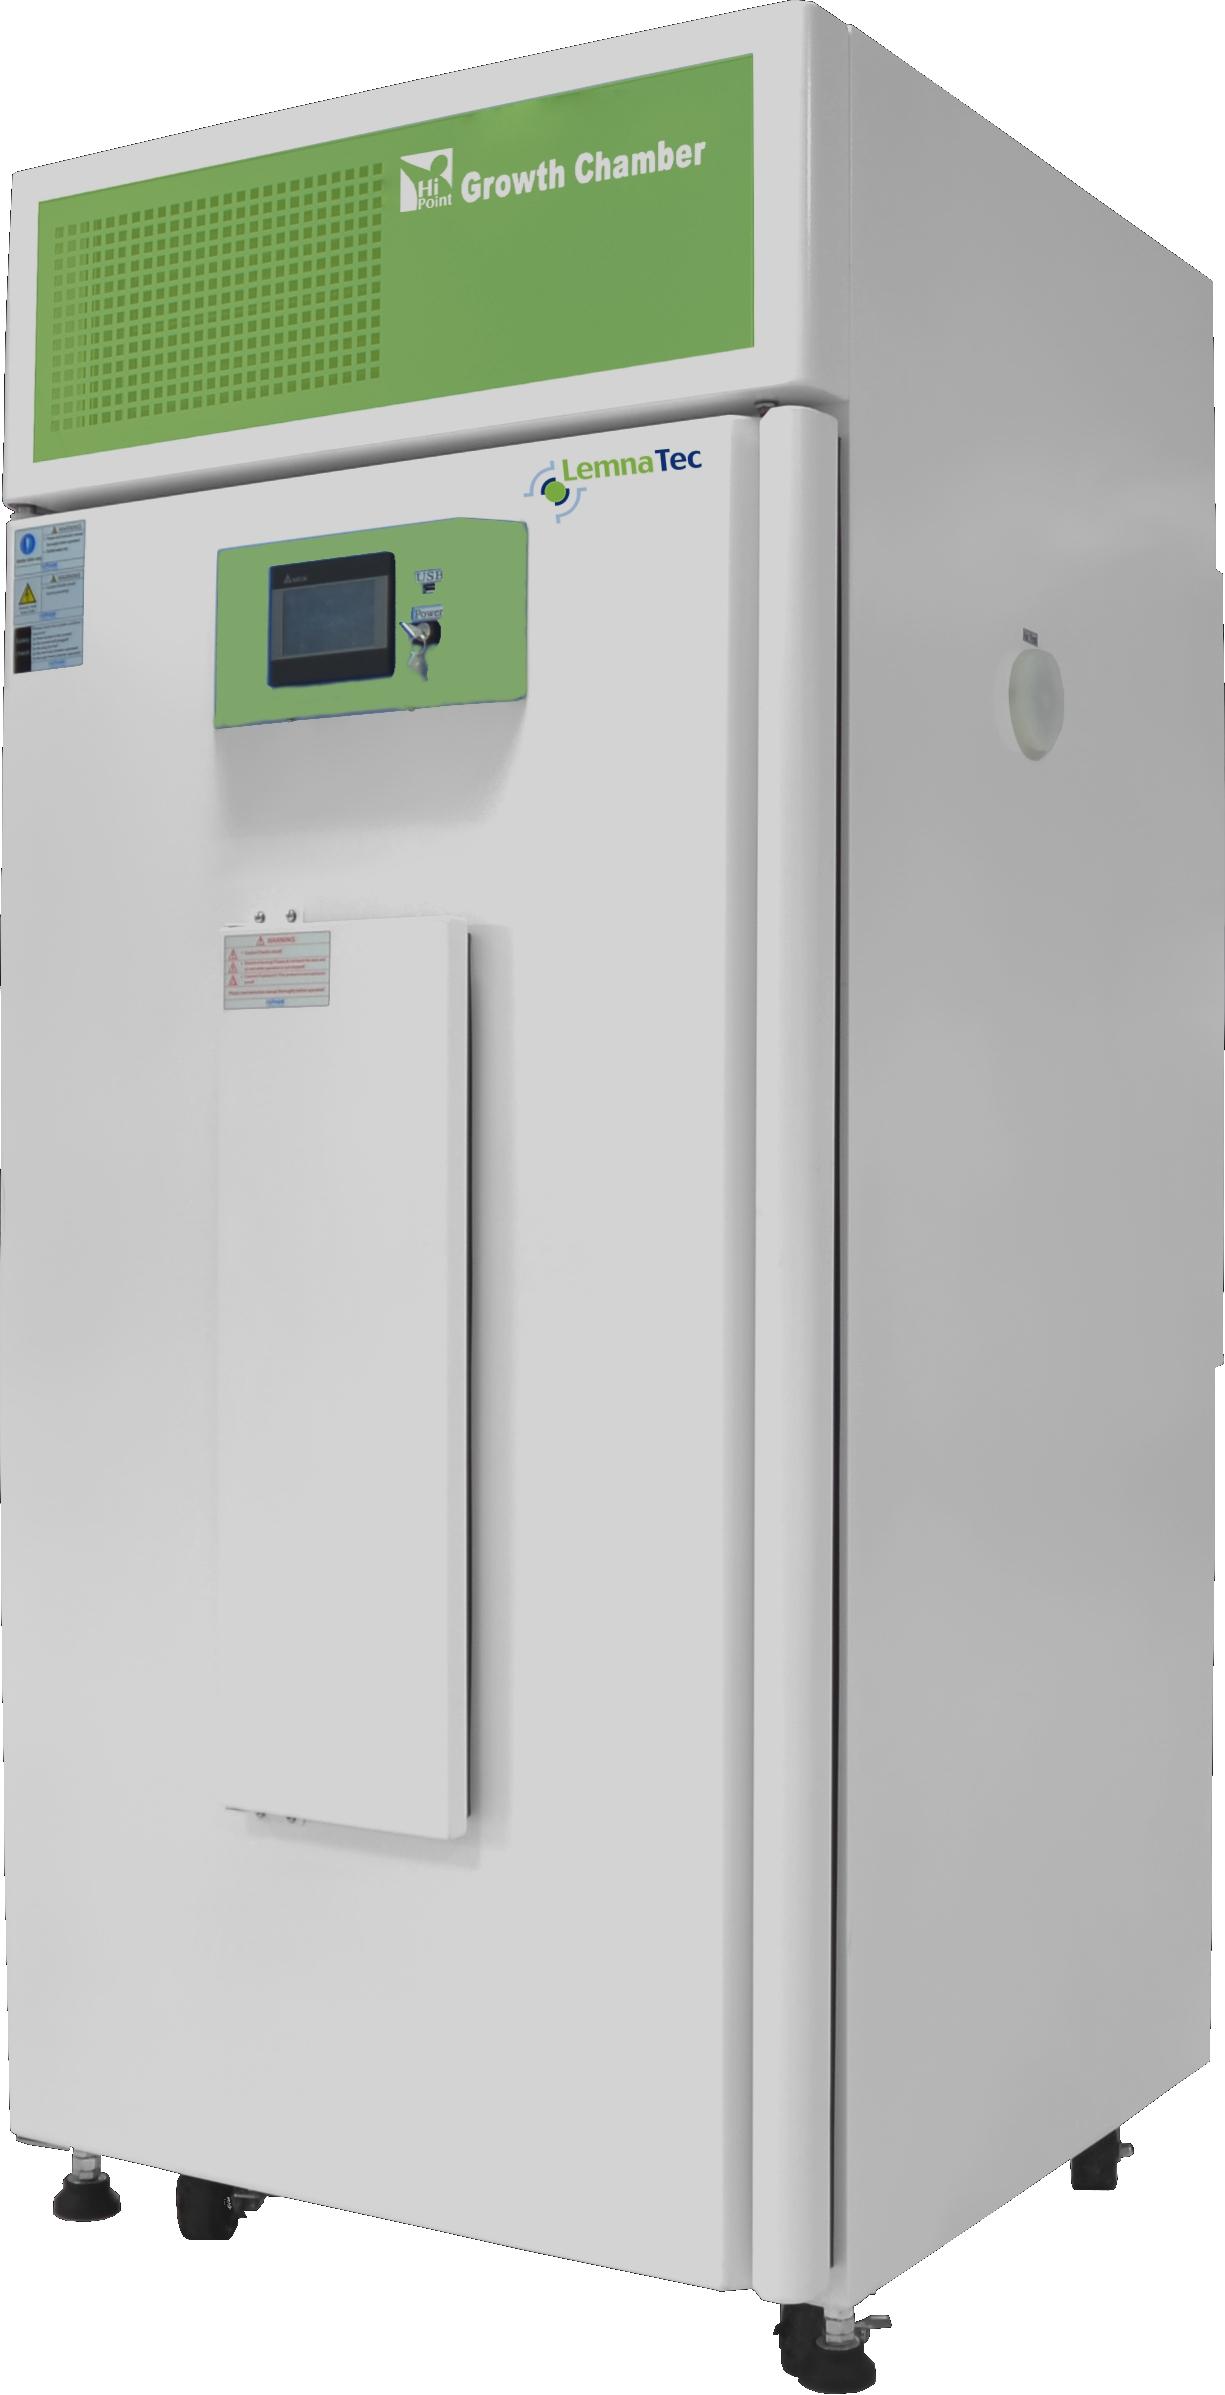 LemnaTec Climate Cabinet Model 740